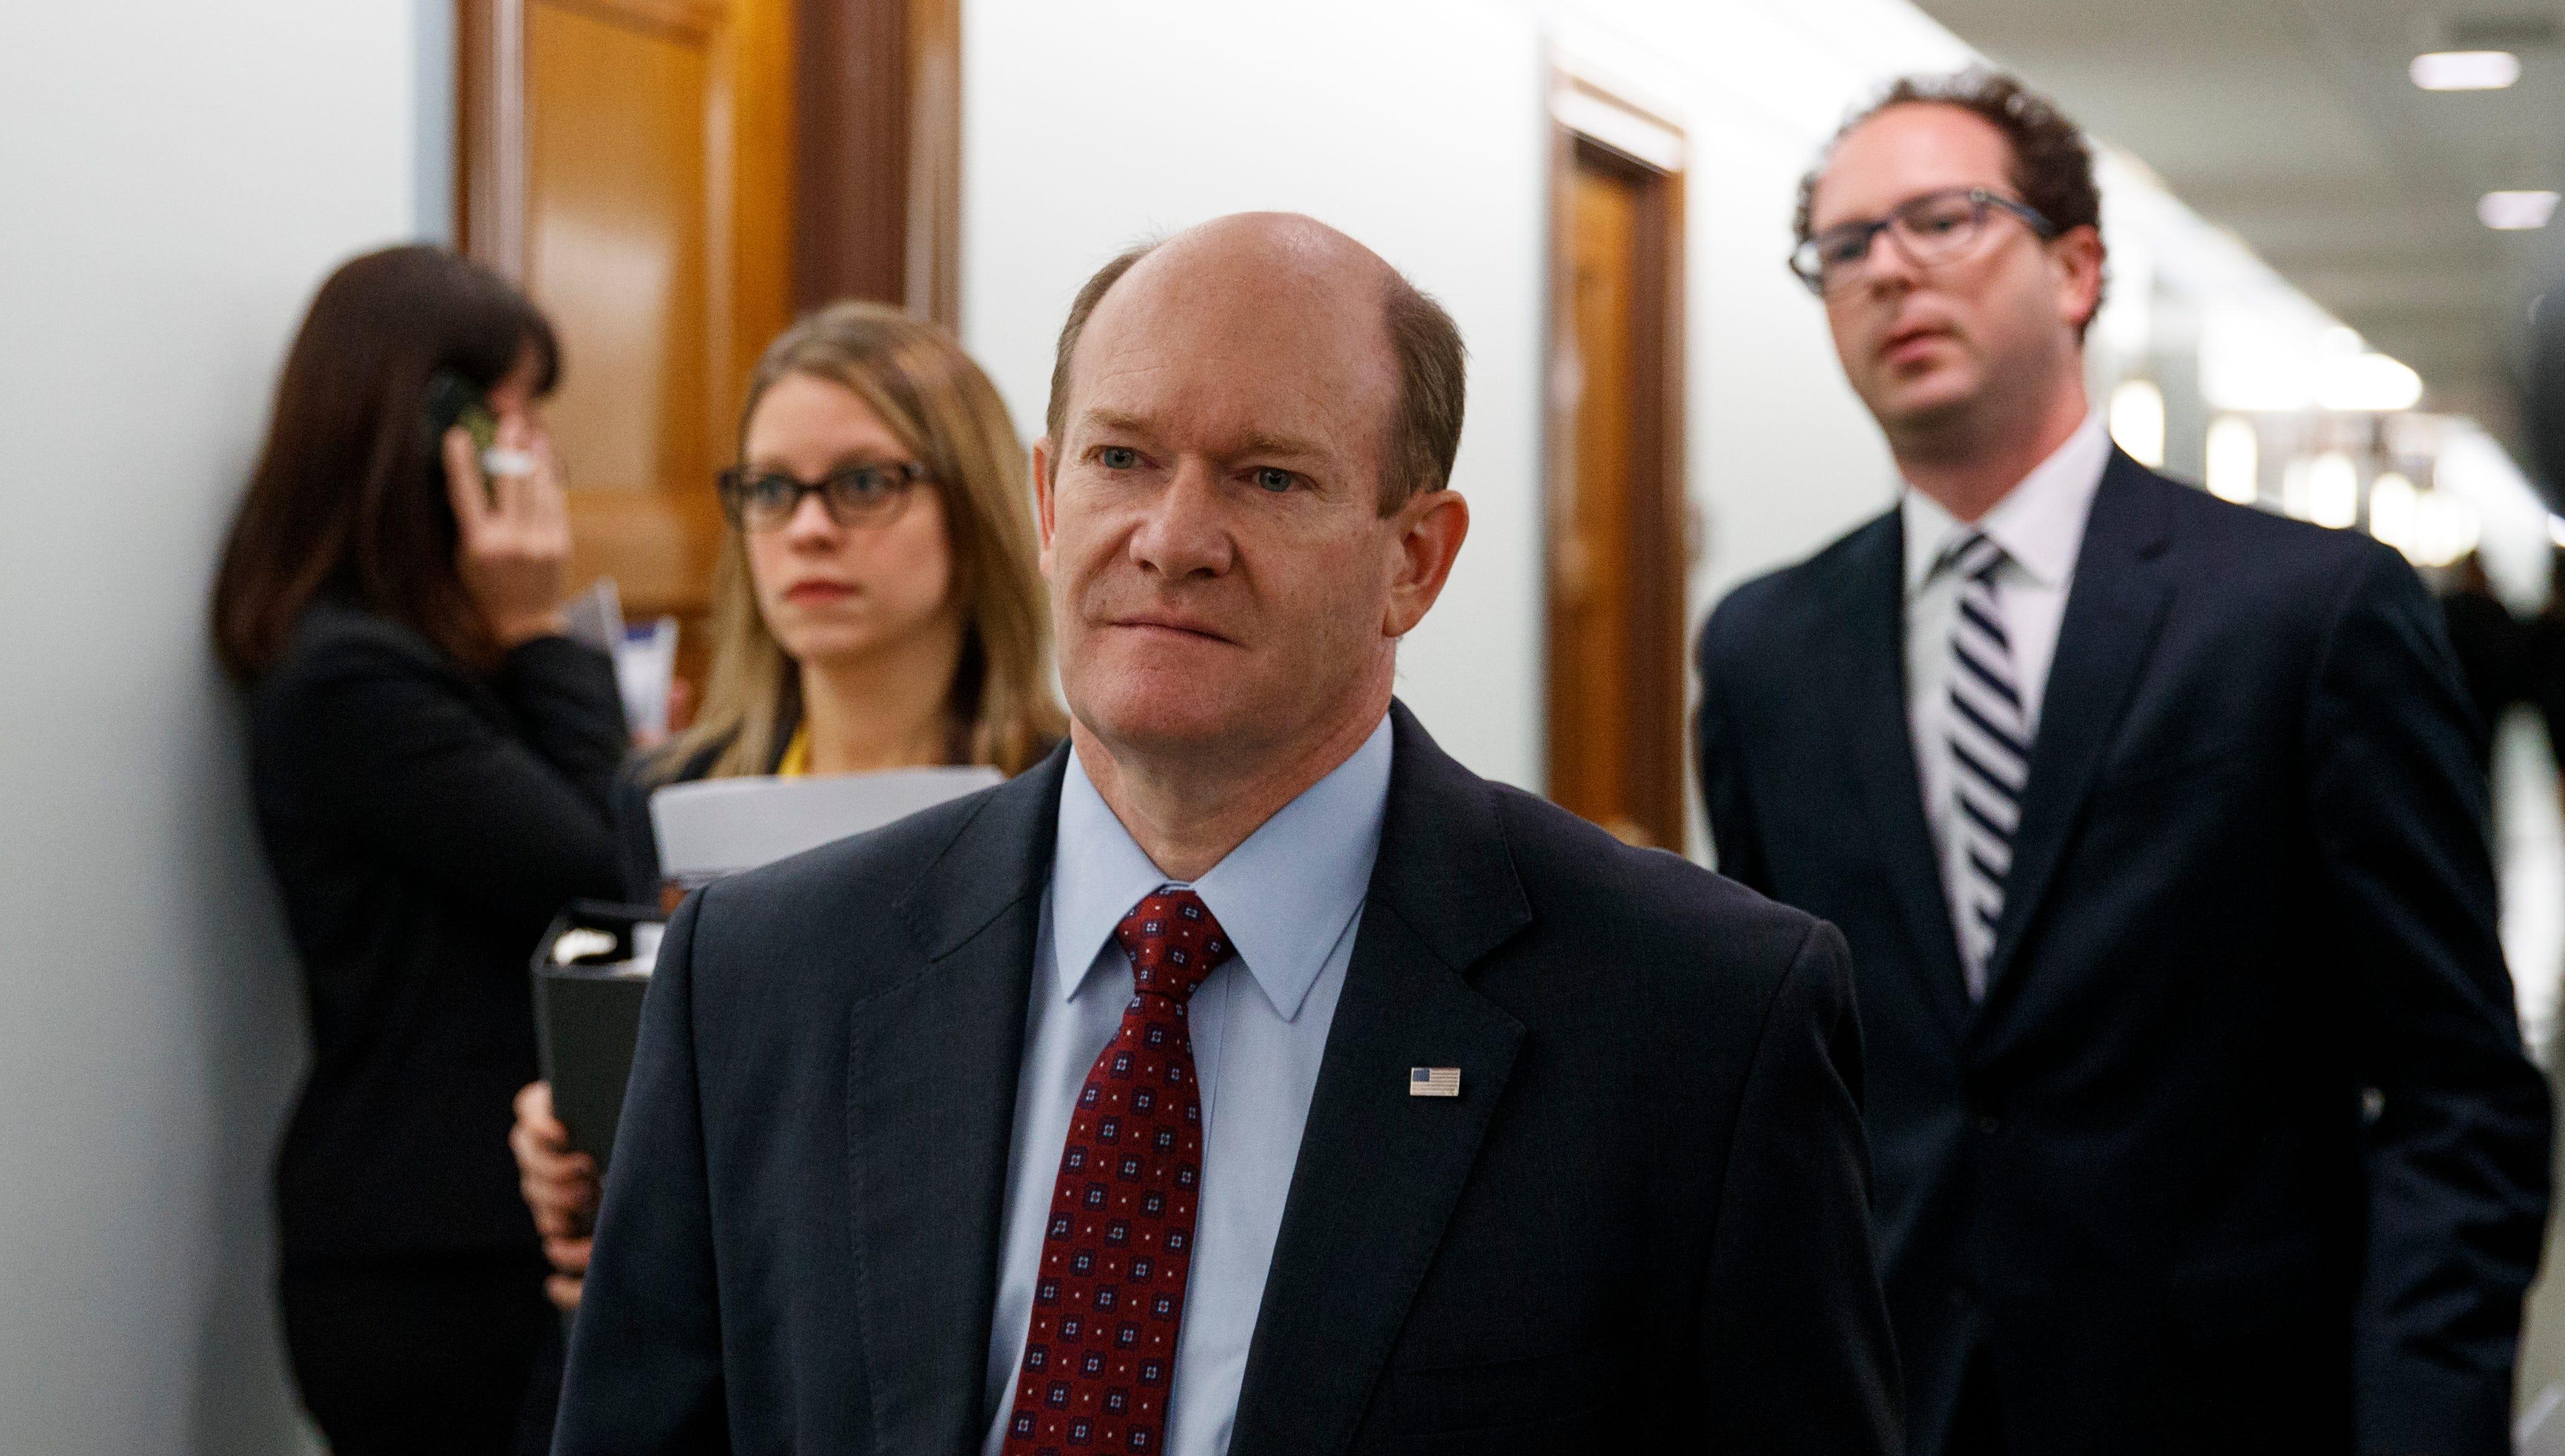 Analysis: Sen. Chris Coons' reputation for bipartisanship pays off spectacularly